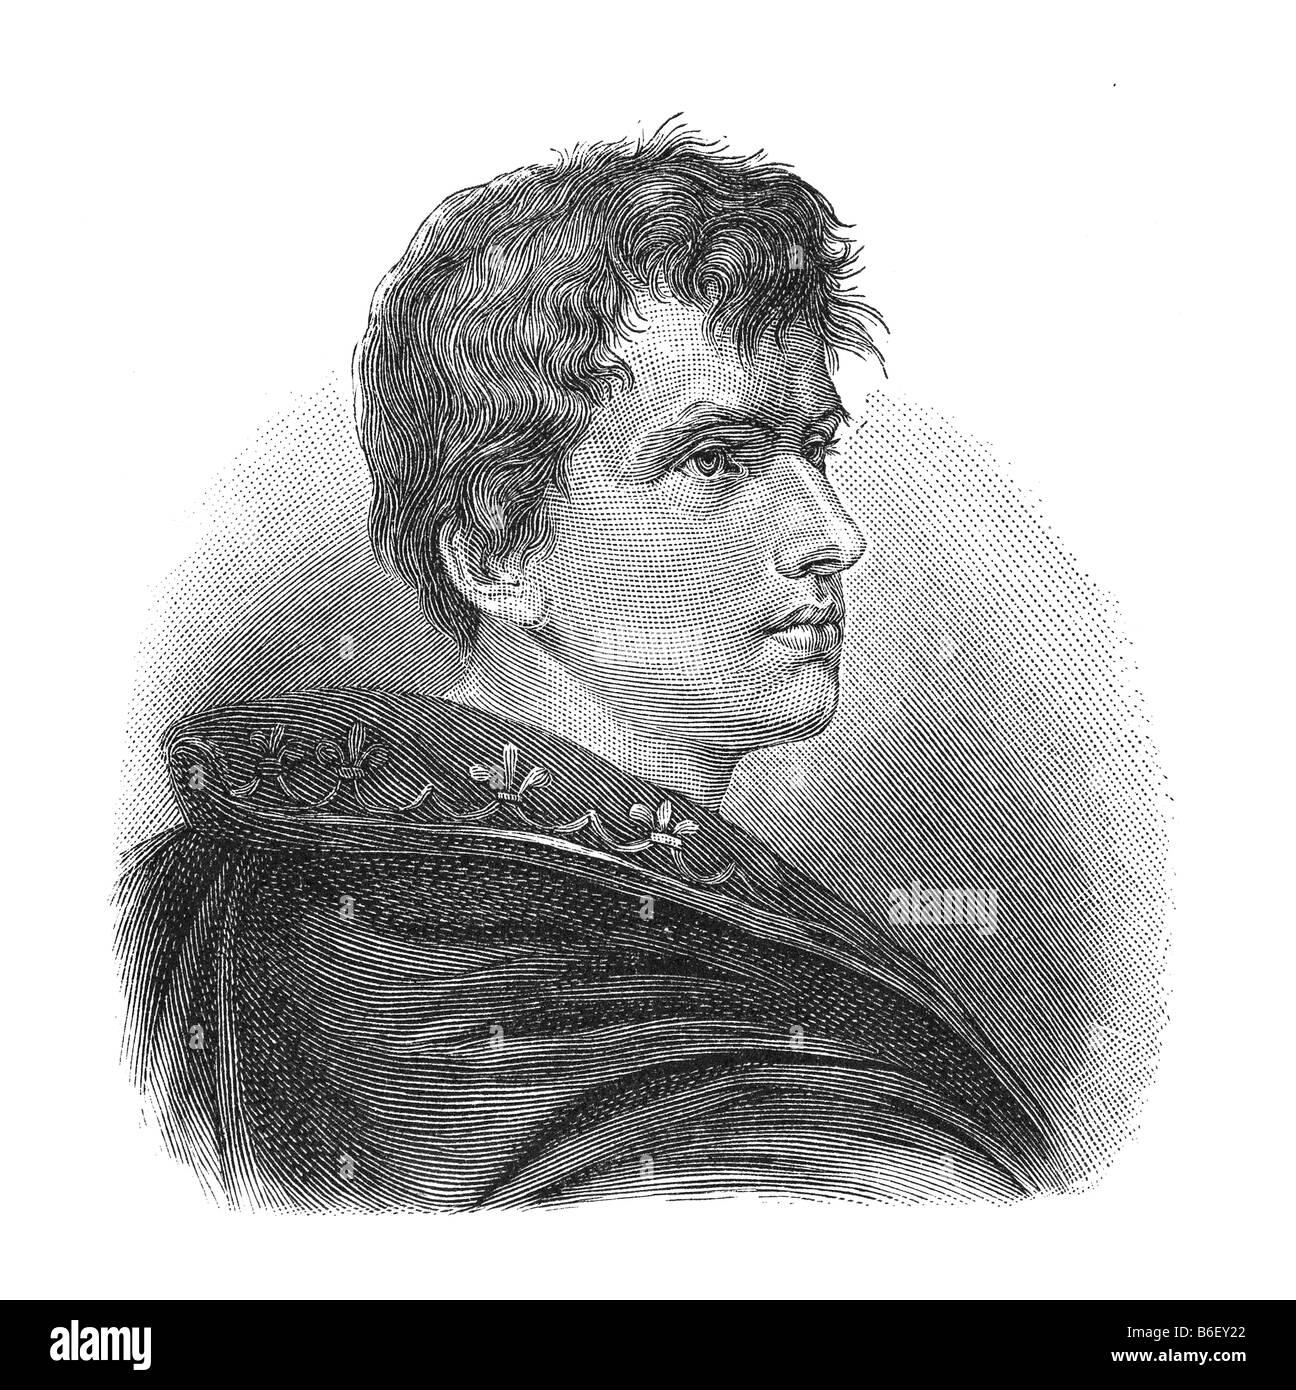 Carl Joachim Friedrich Ludwig von Arnim, 26. Januar 1781 Berlin - 21. Januar 1831 Schloss Wiepersdorf, Bereich Jüterbog Stockbild